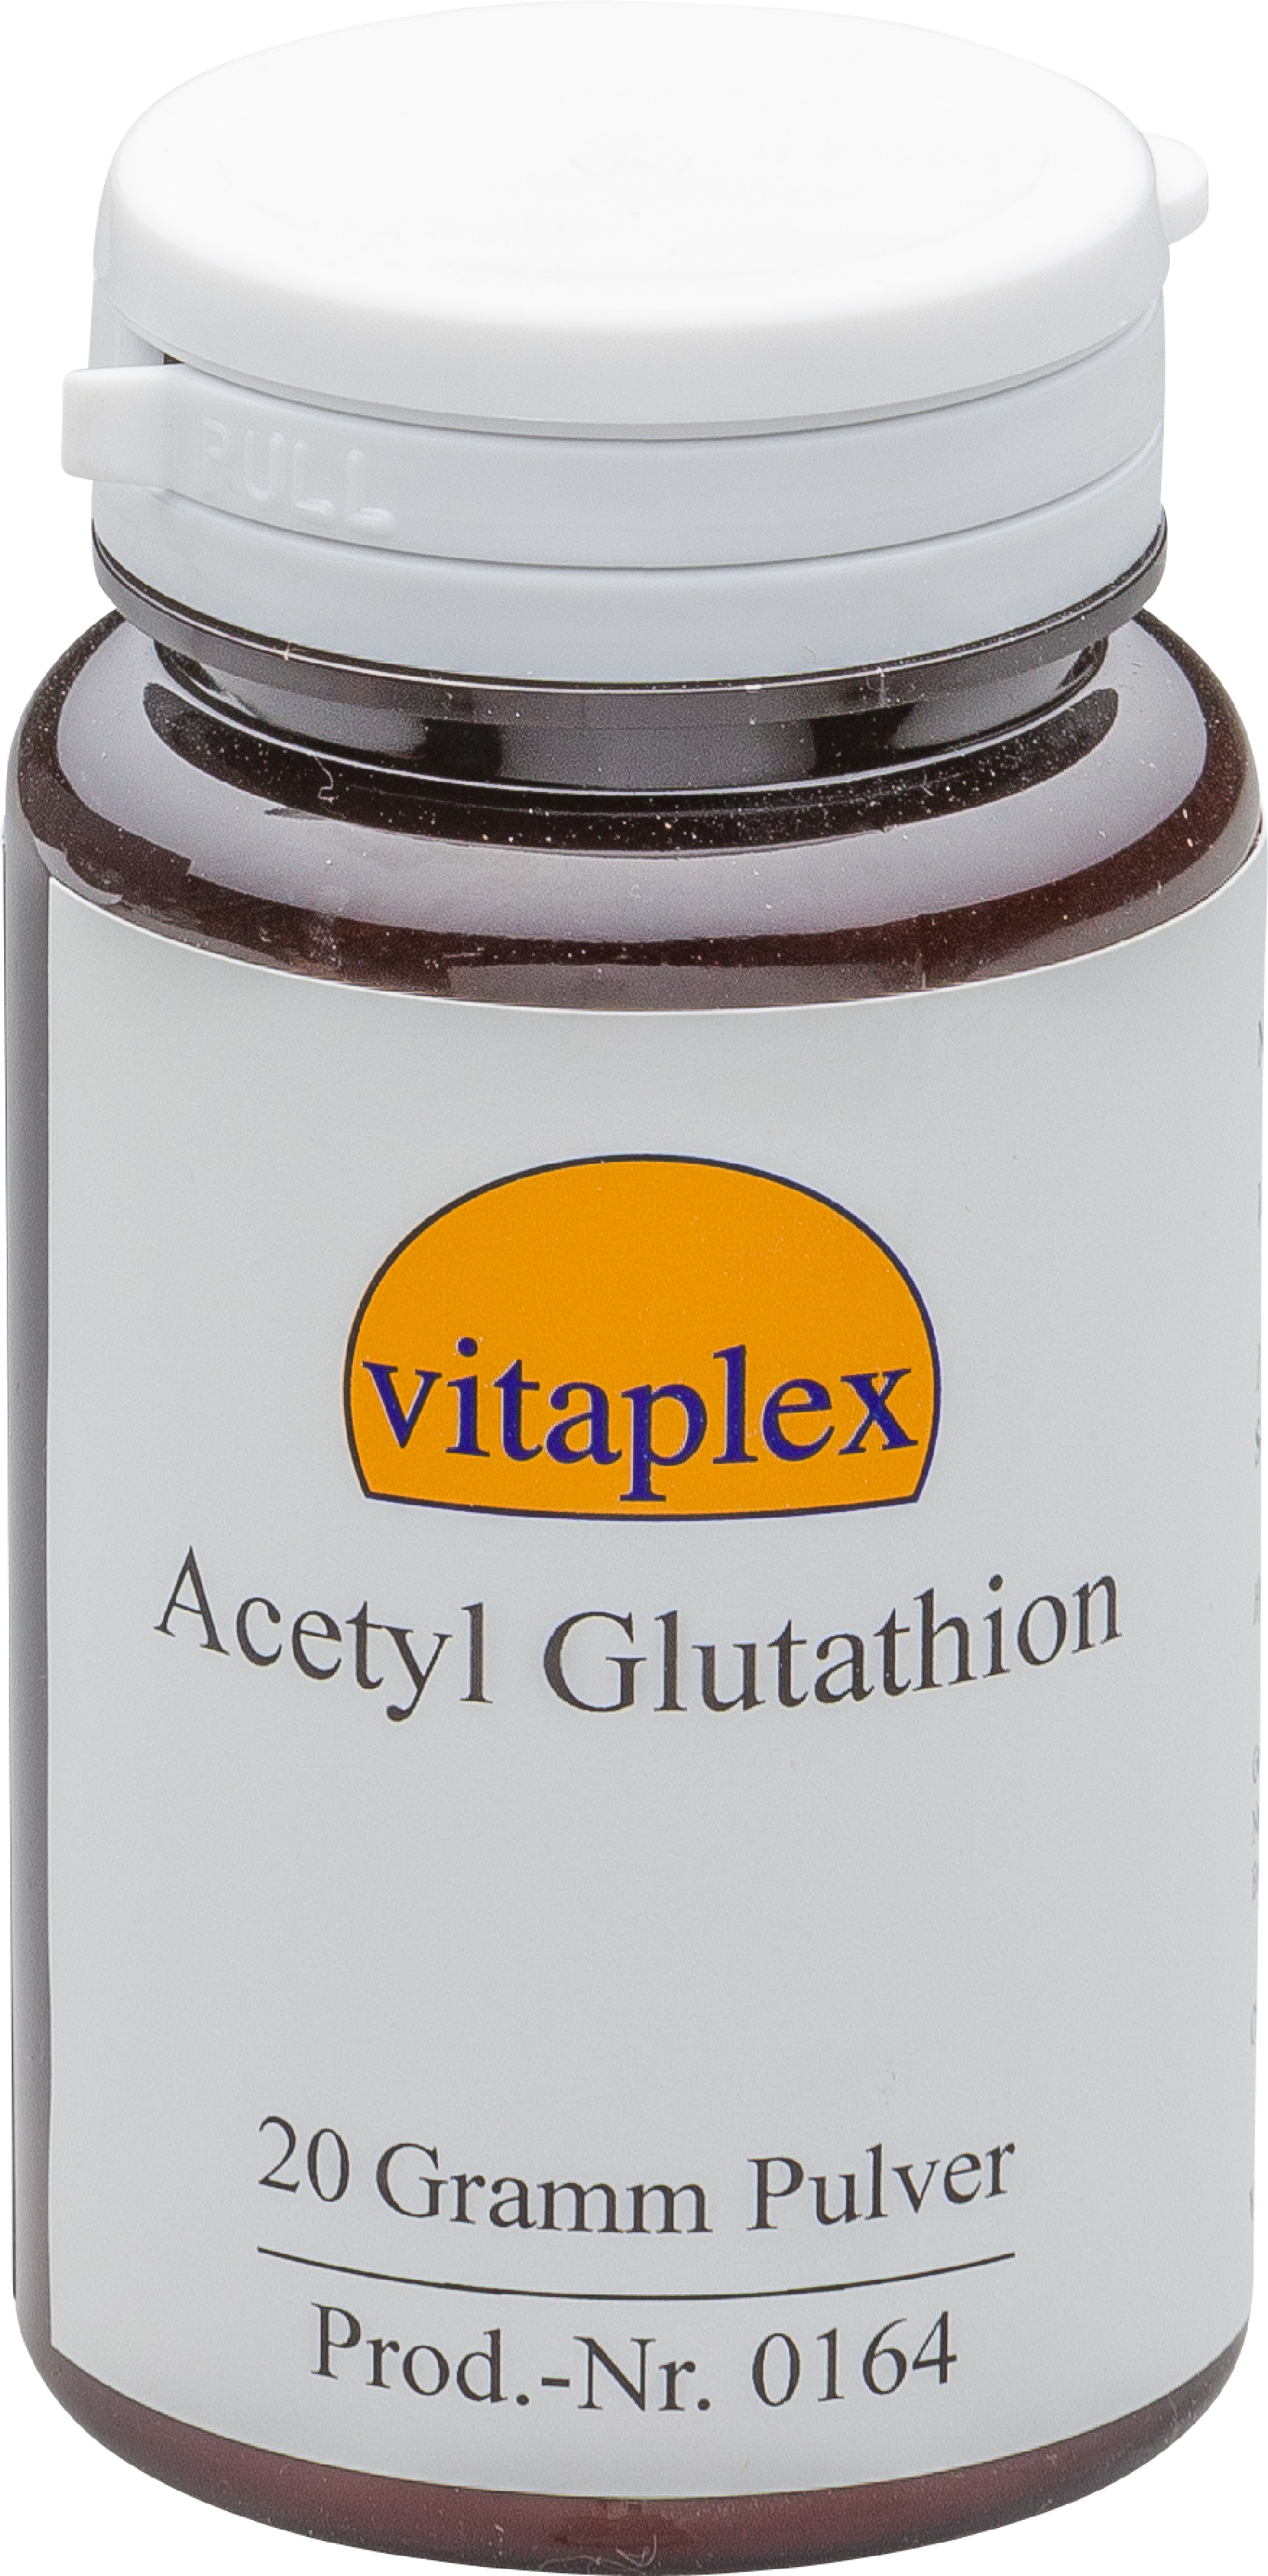 Acetile Glutathion polvere (polvere di 20 grammi) Vitaplex